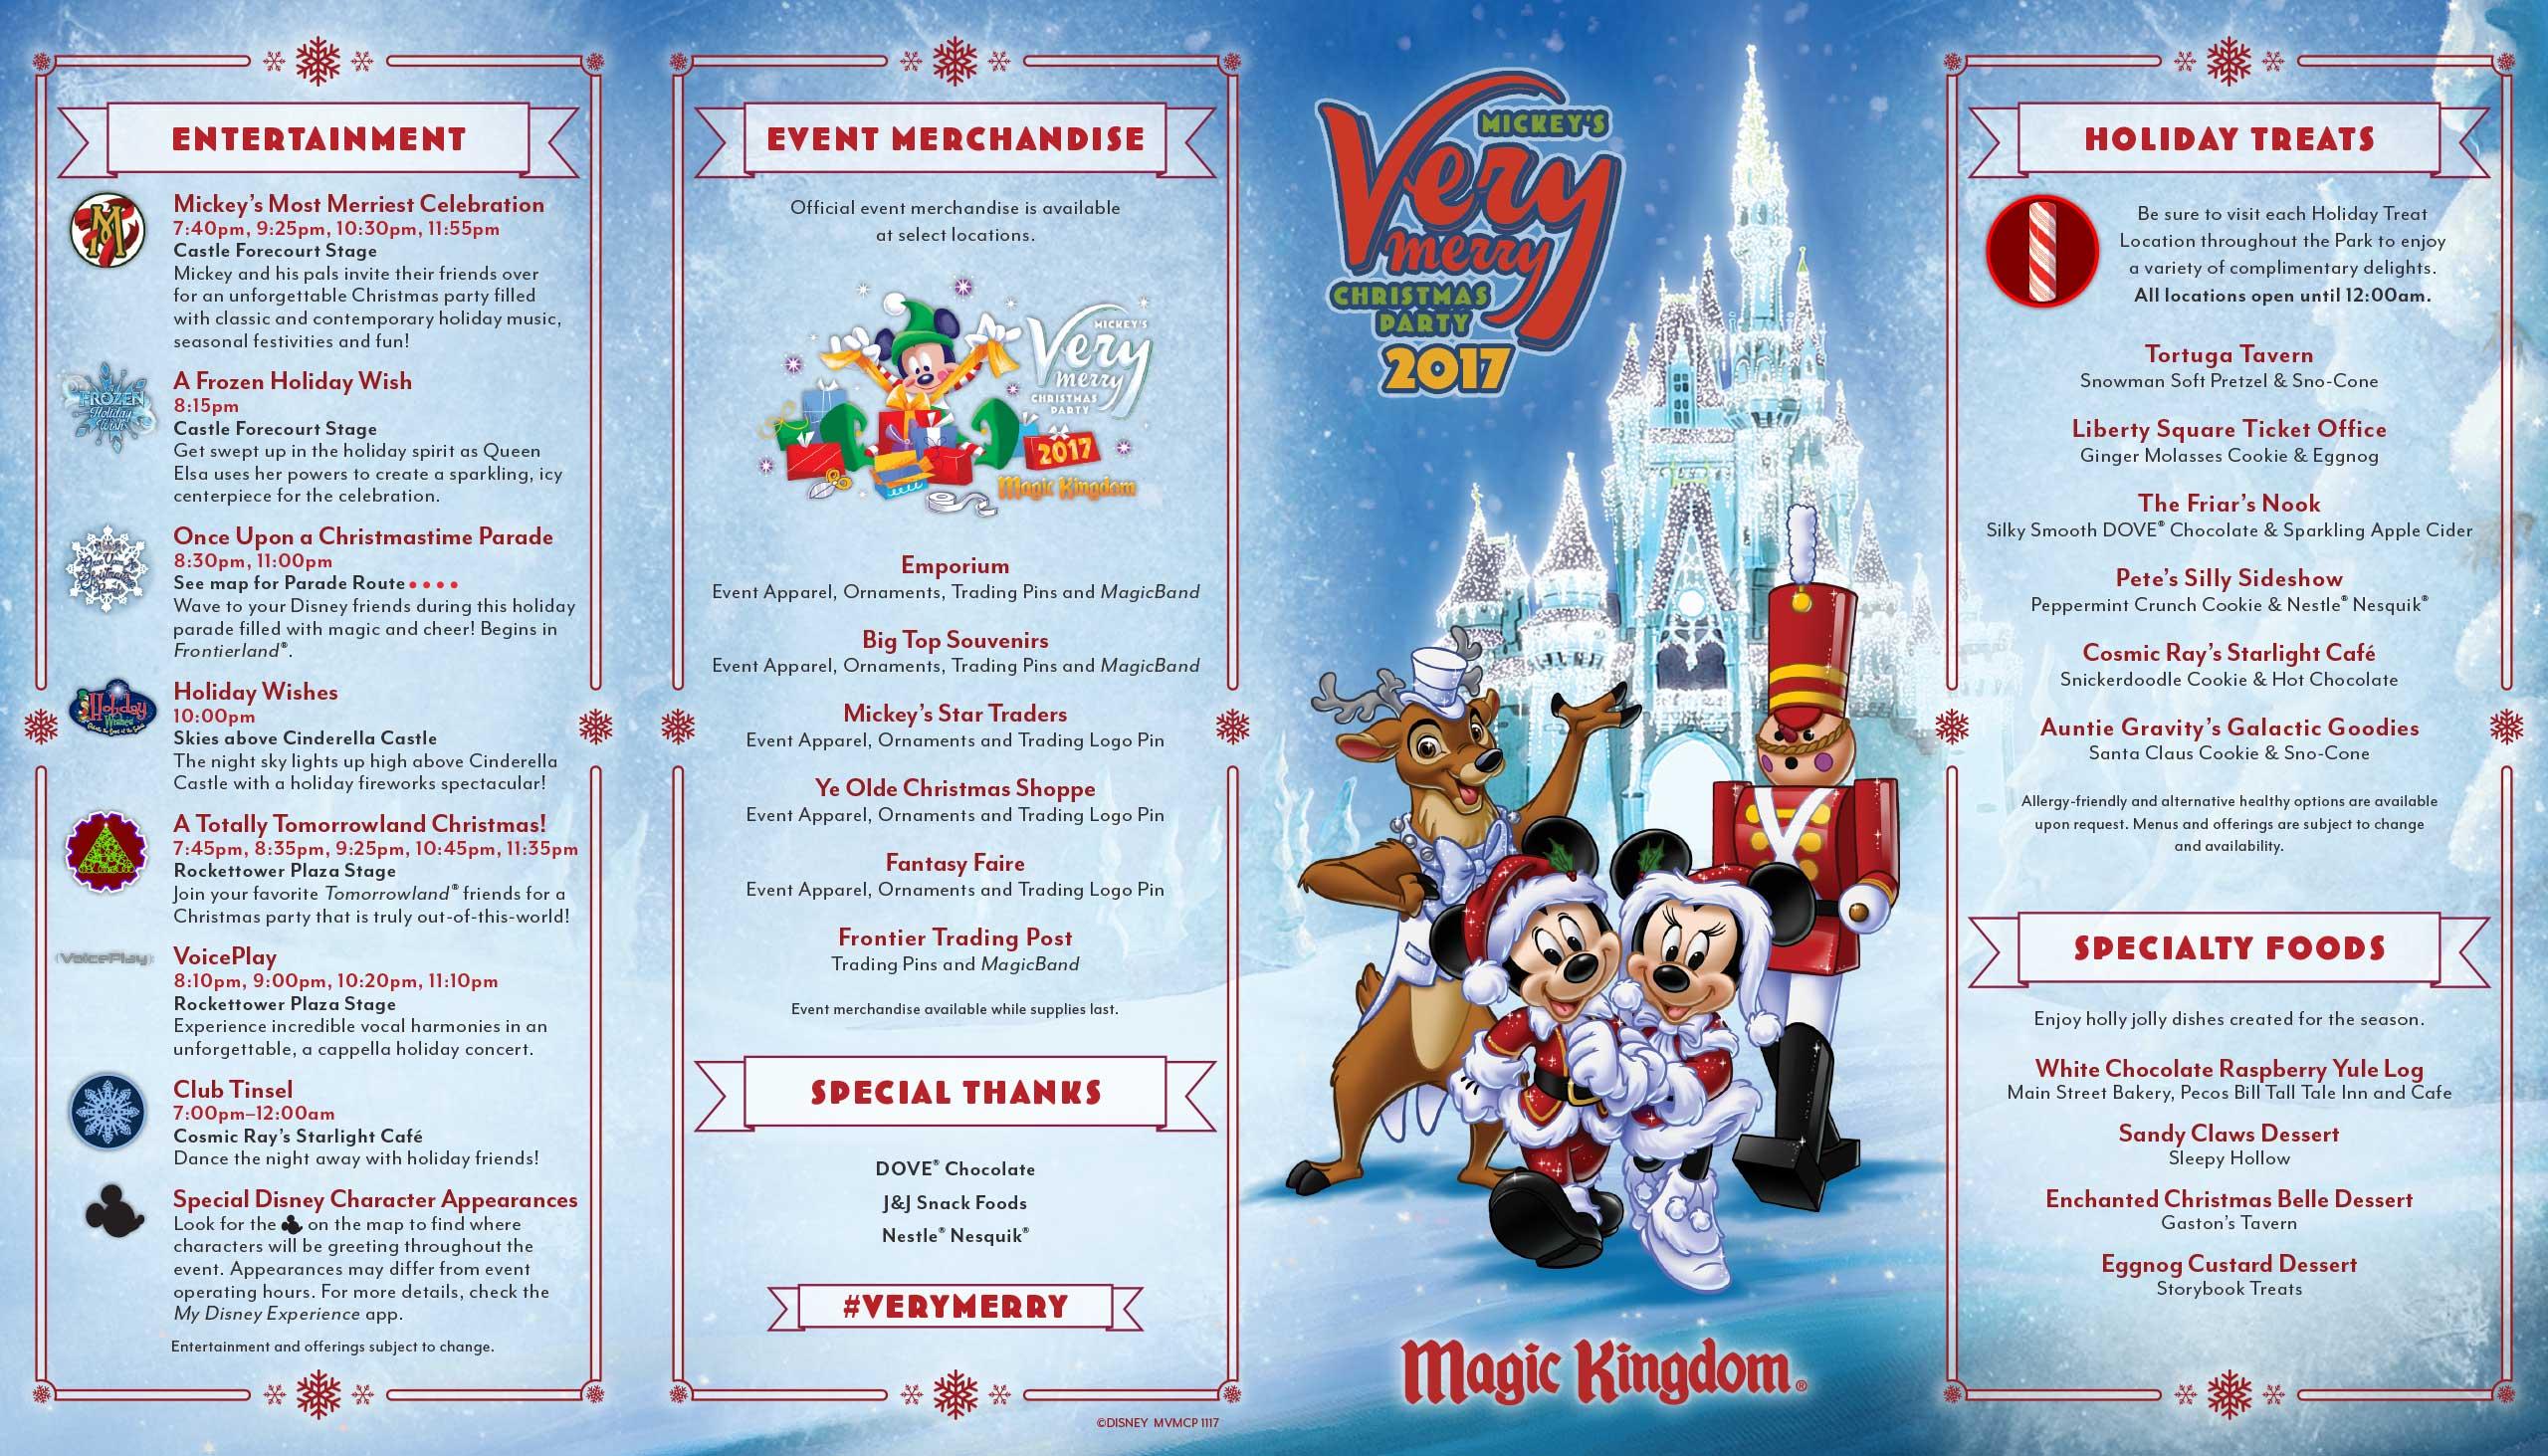 Mickeys Very Merry Christmas Party 2019.Mickey S Very Merry Christmas Party 2017 Guide Map Photo 1